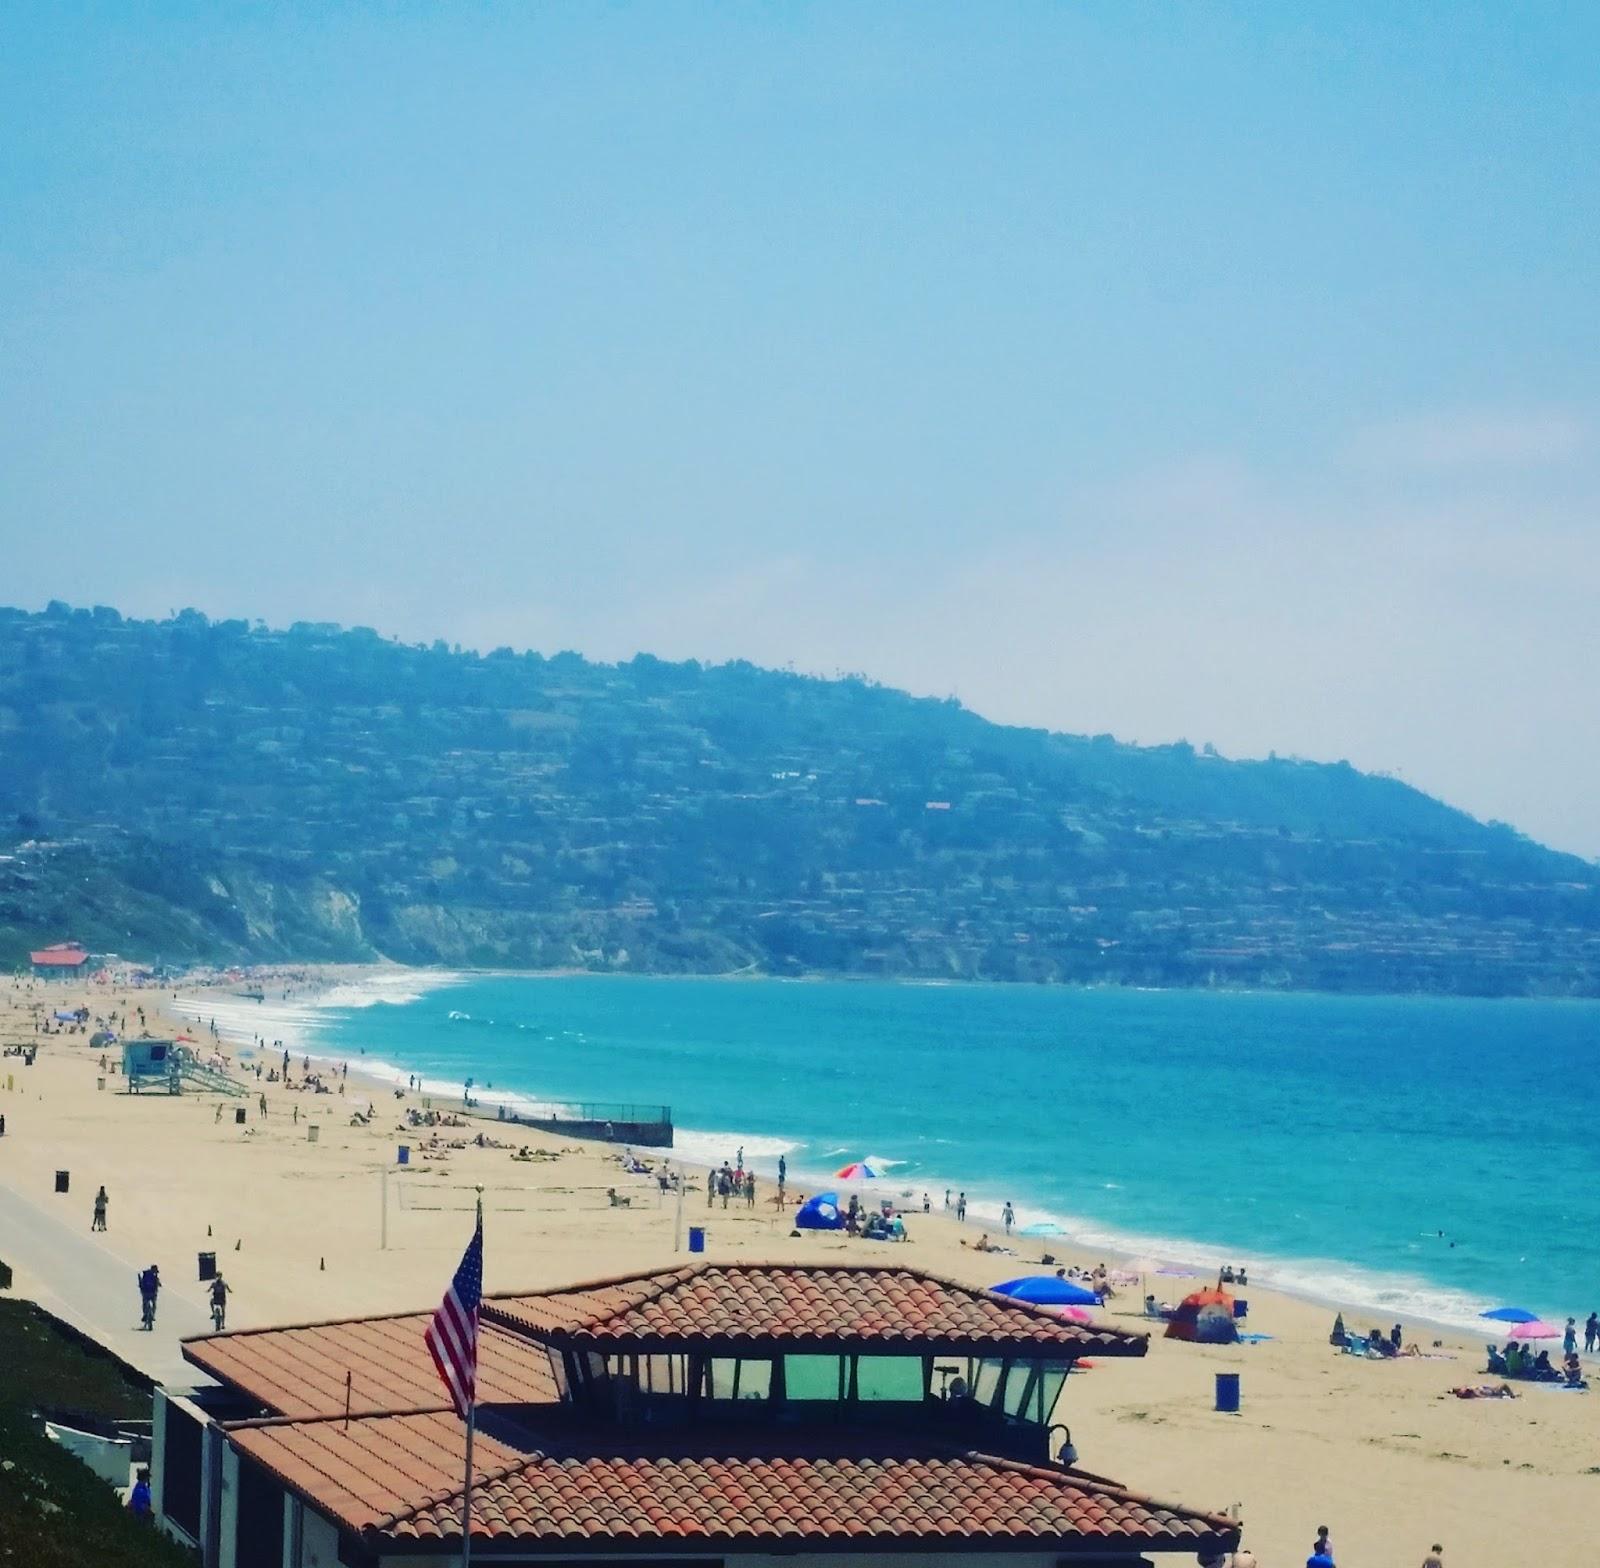 Redondo Beach in Los Angeles, California